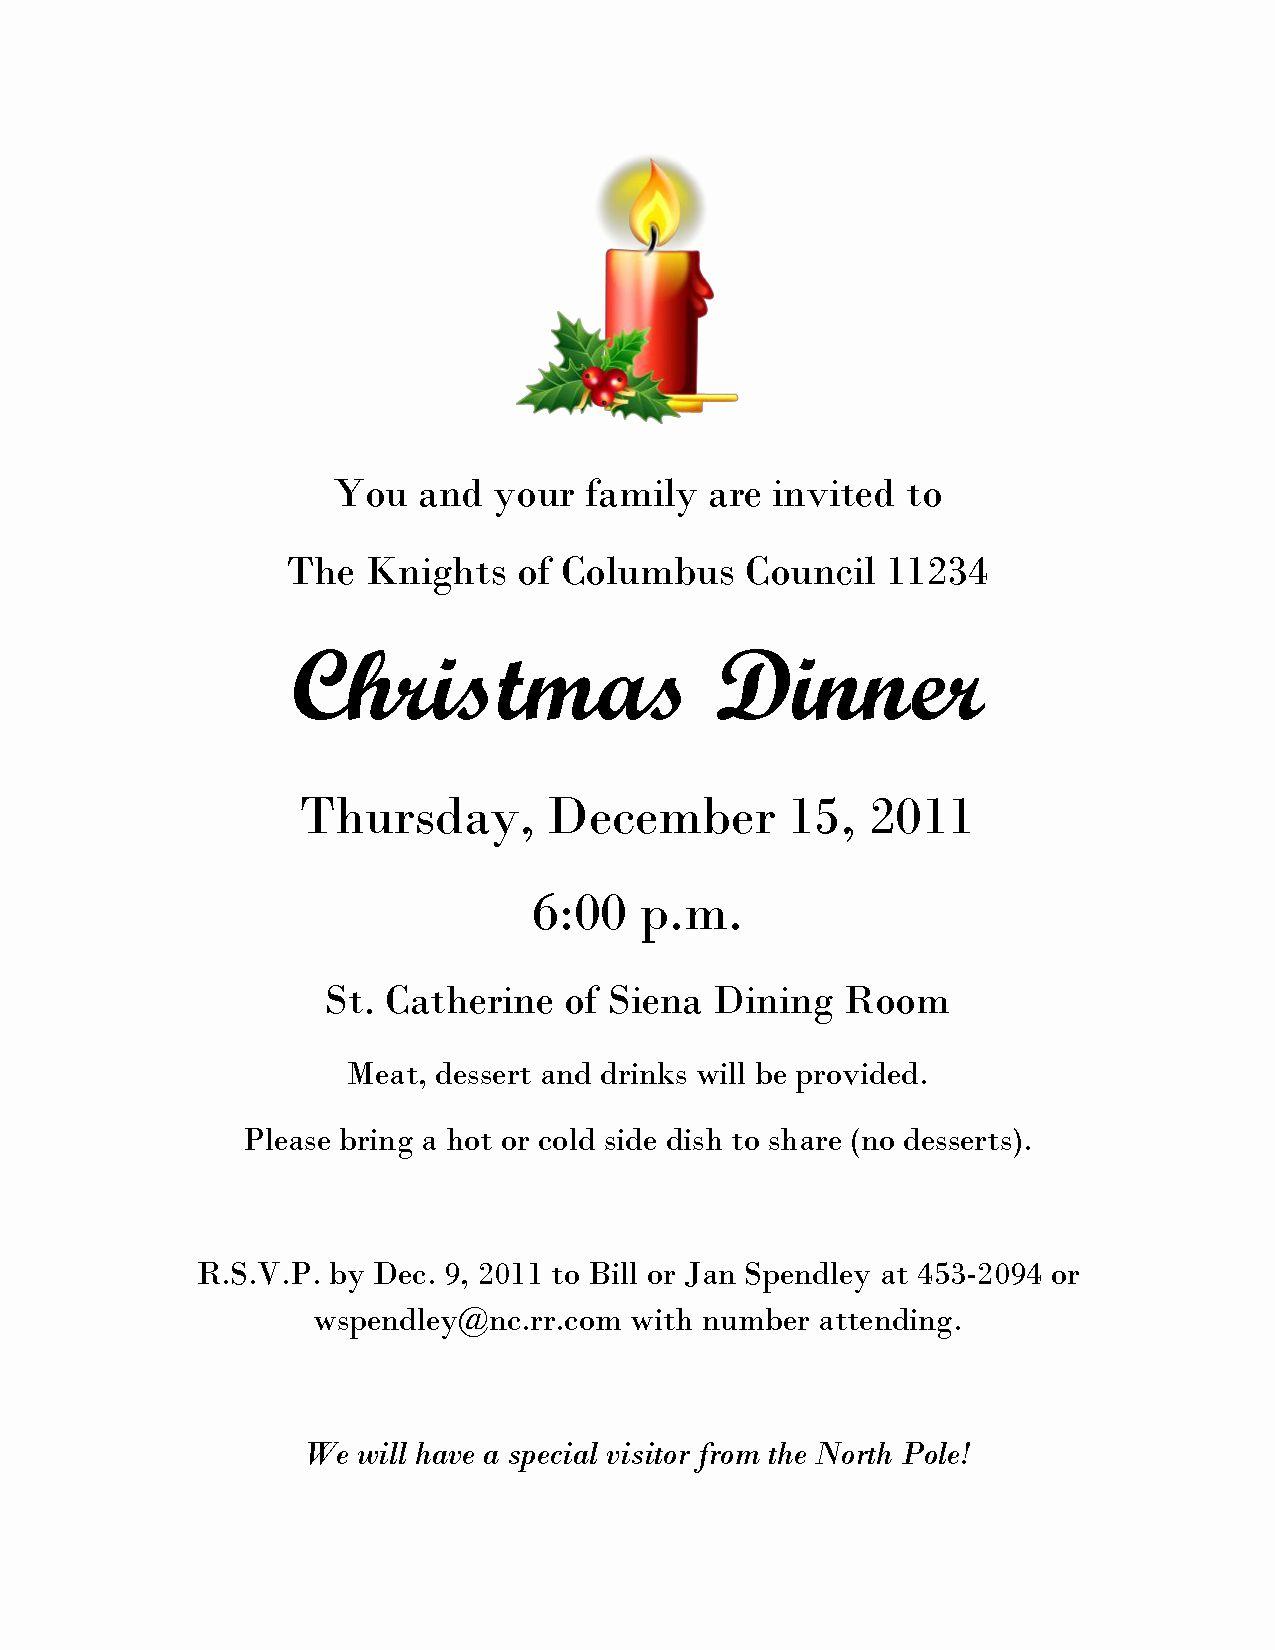 Christmas Dinner Invitation Template Elegant Christmas Eve